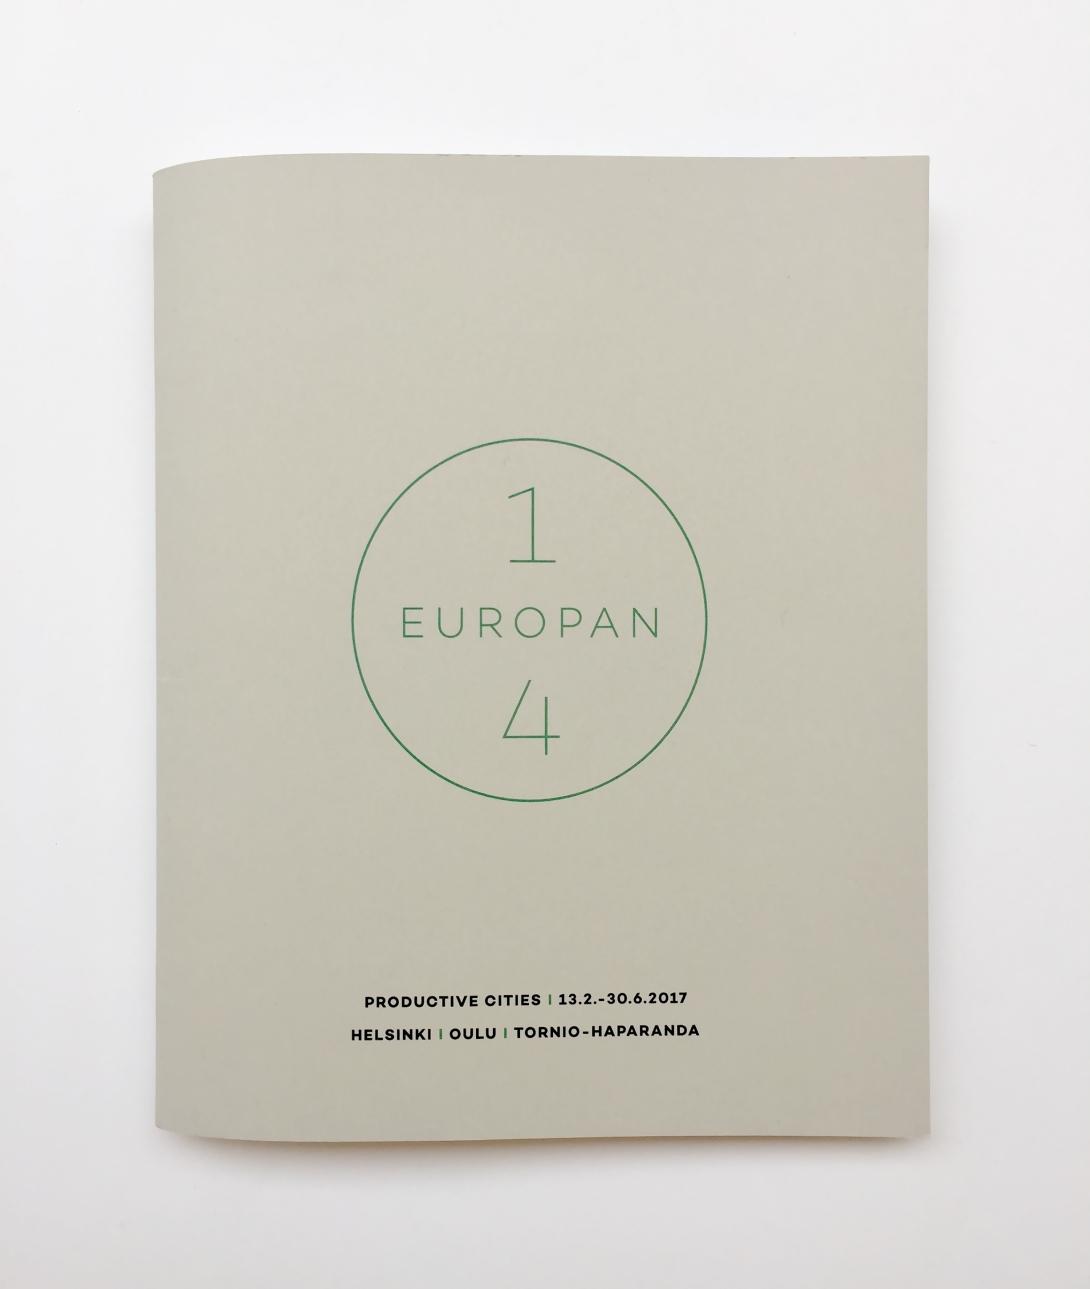 europan_esite